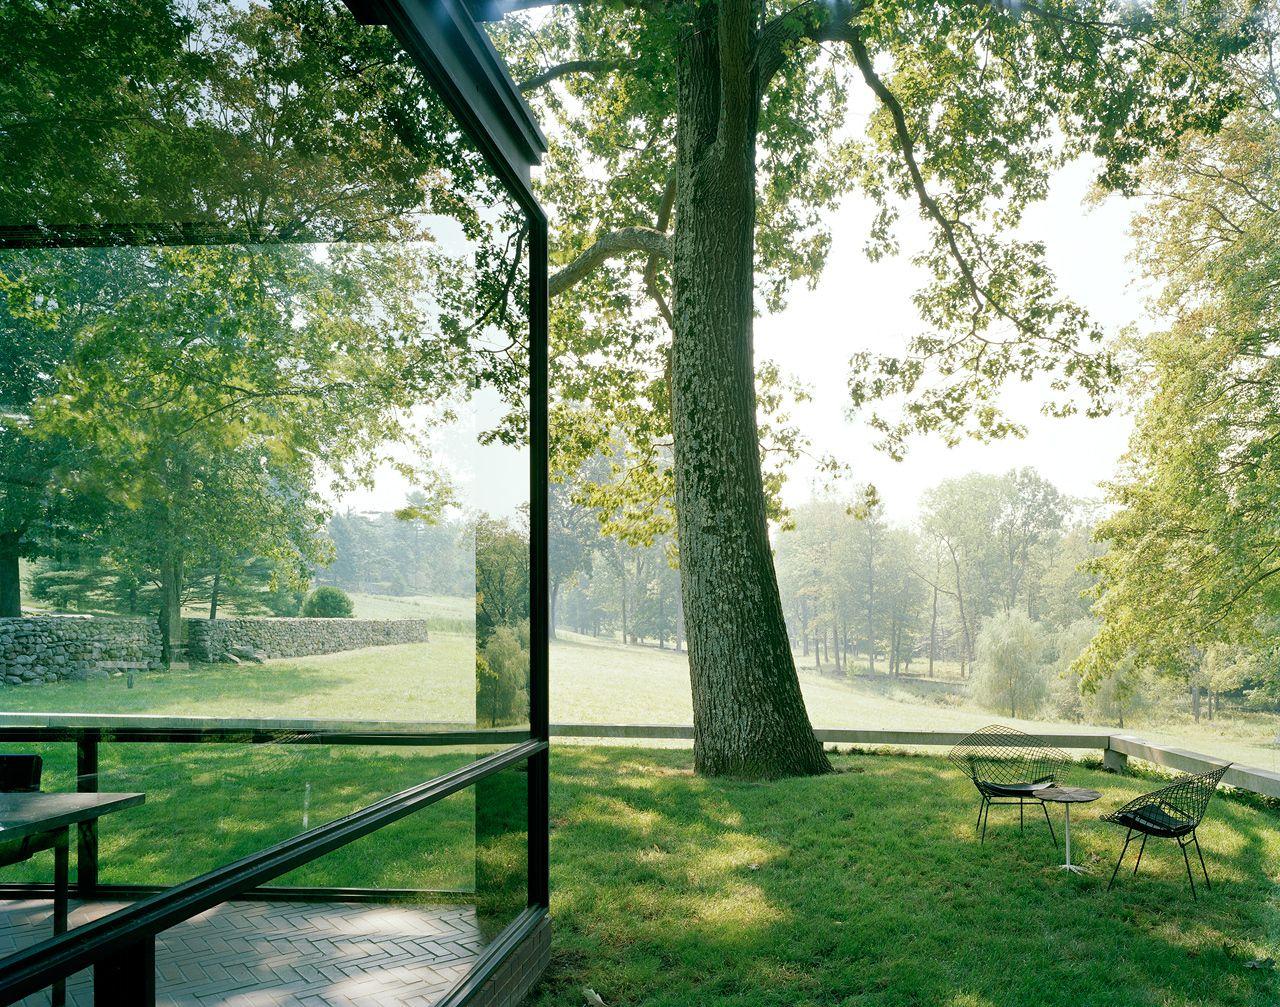 Philip Cortelyou Johnson (1906-2005) | The Glass House for Philip Johnson and David Whitney | 199 Elm St, New Canaan, Connecticut | 1949-1986 | Photo: Eirik Johnson